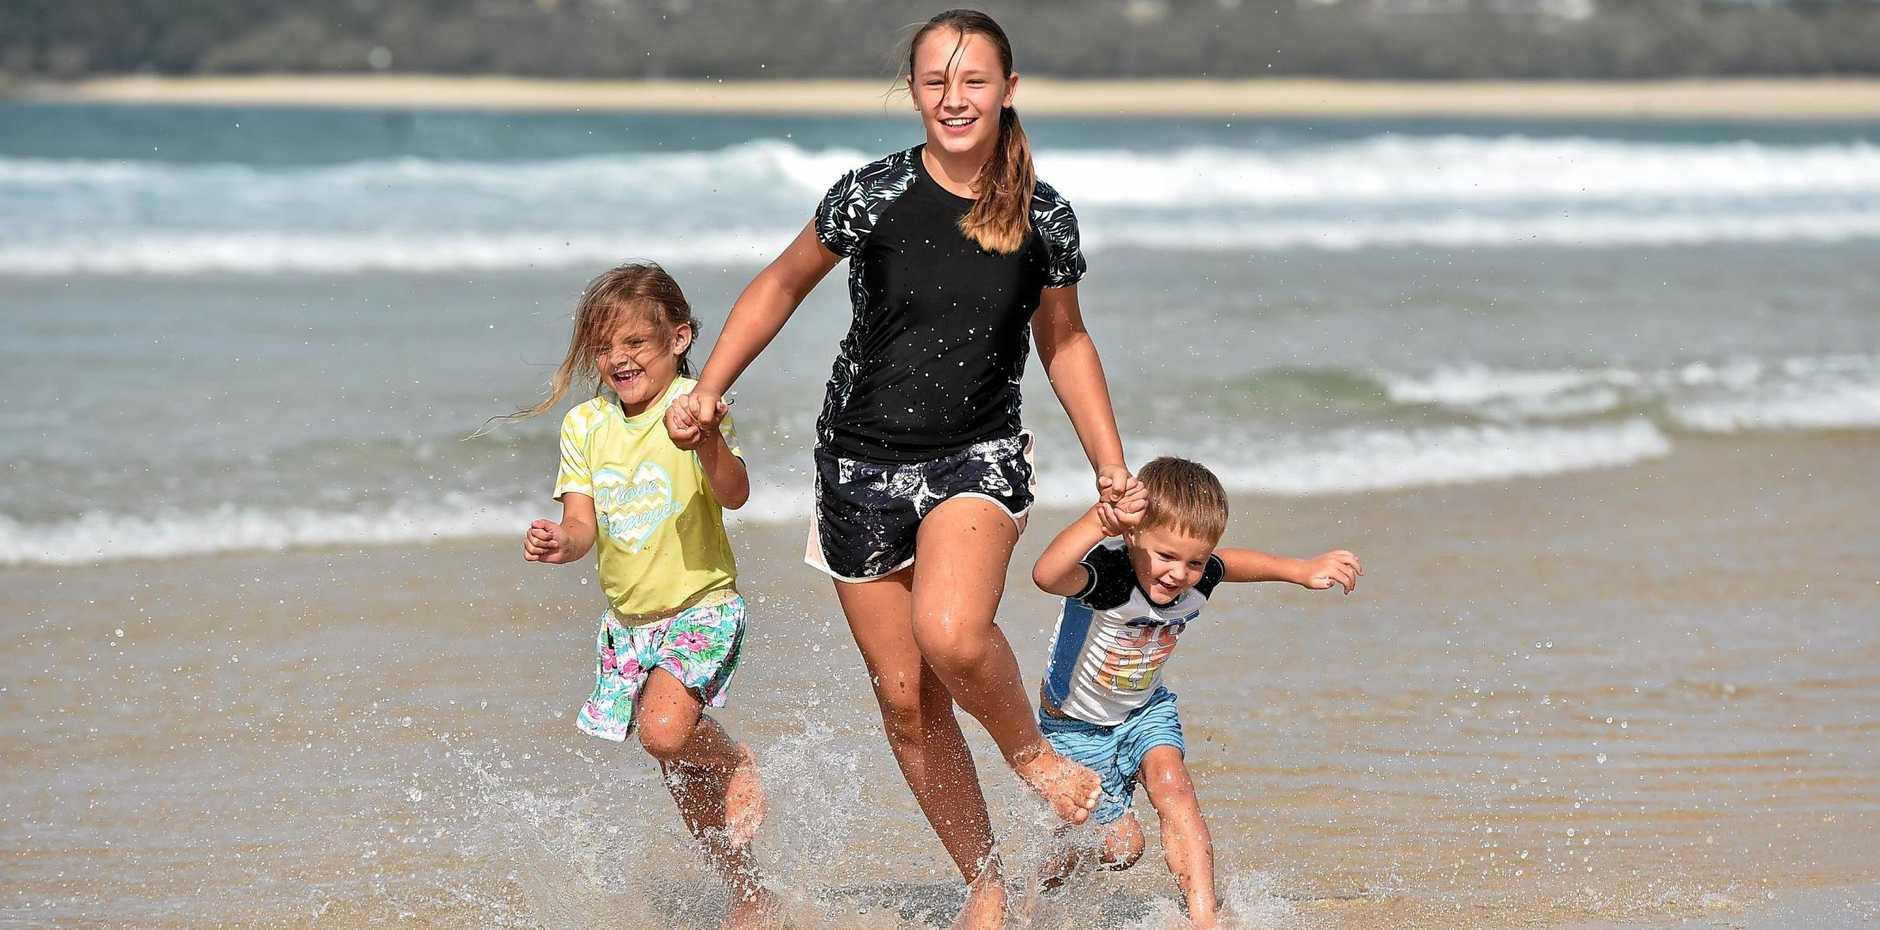 Victorian tourists April, 5, Paige, 13, and Taylor Marcroft, 3, enjoy a splash at Mooloolaba Beach.